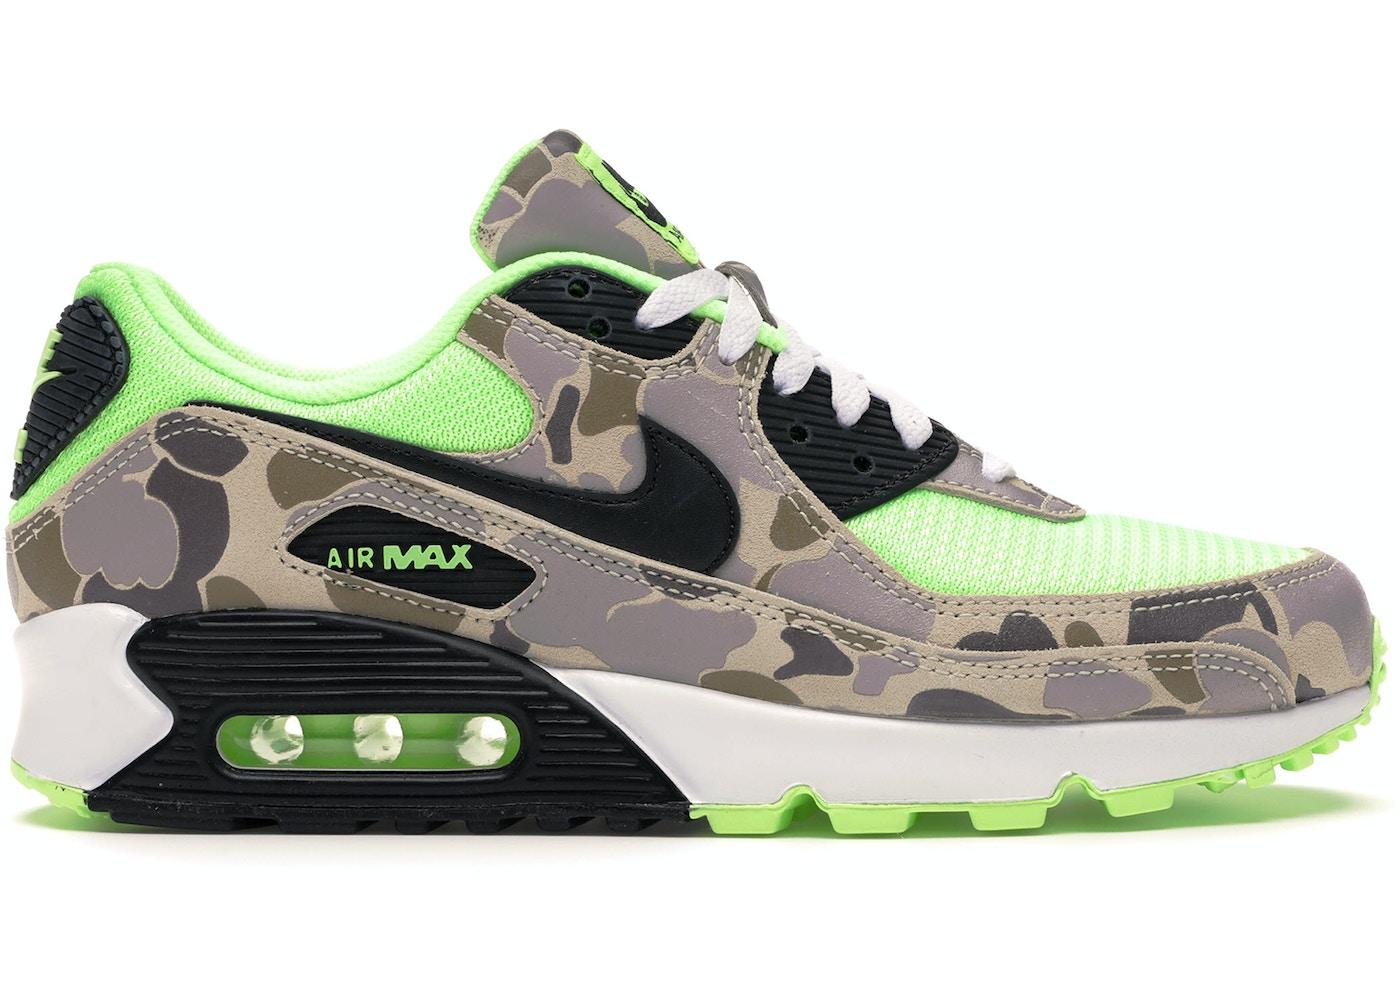 Transparentemente Viscoso Melbourne  Nike Air Max 90 Green Camo - CW4039-300